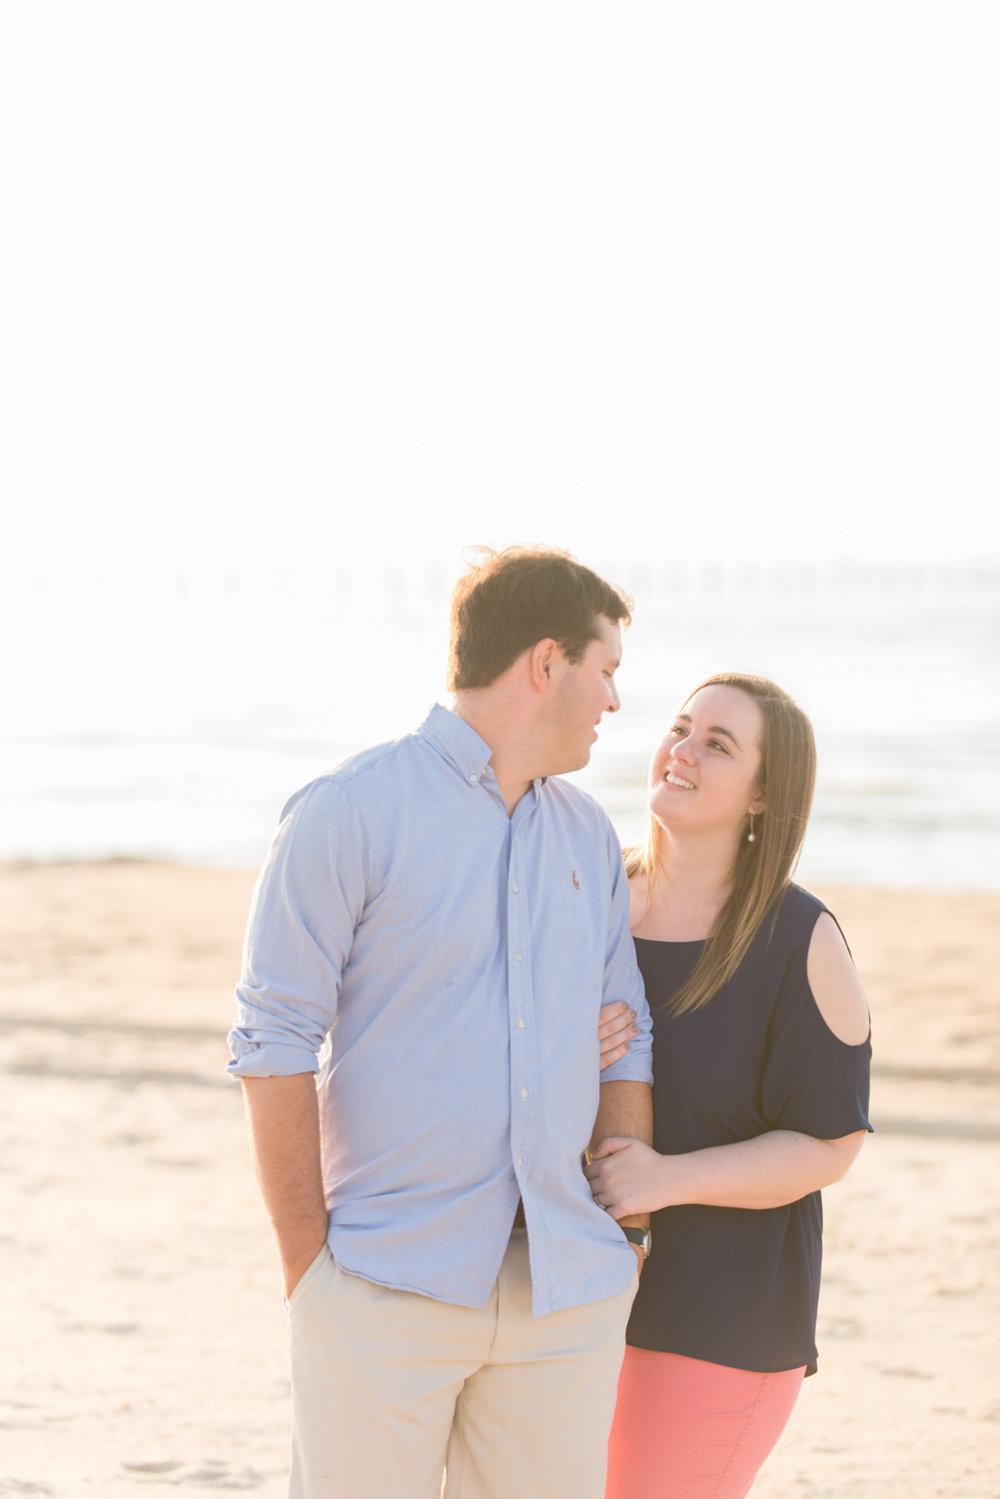 Romantic Sandbridge Engagement Session in Virginia Beach-136.jpg